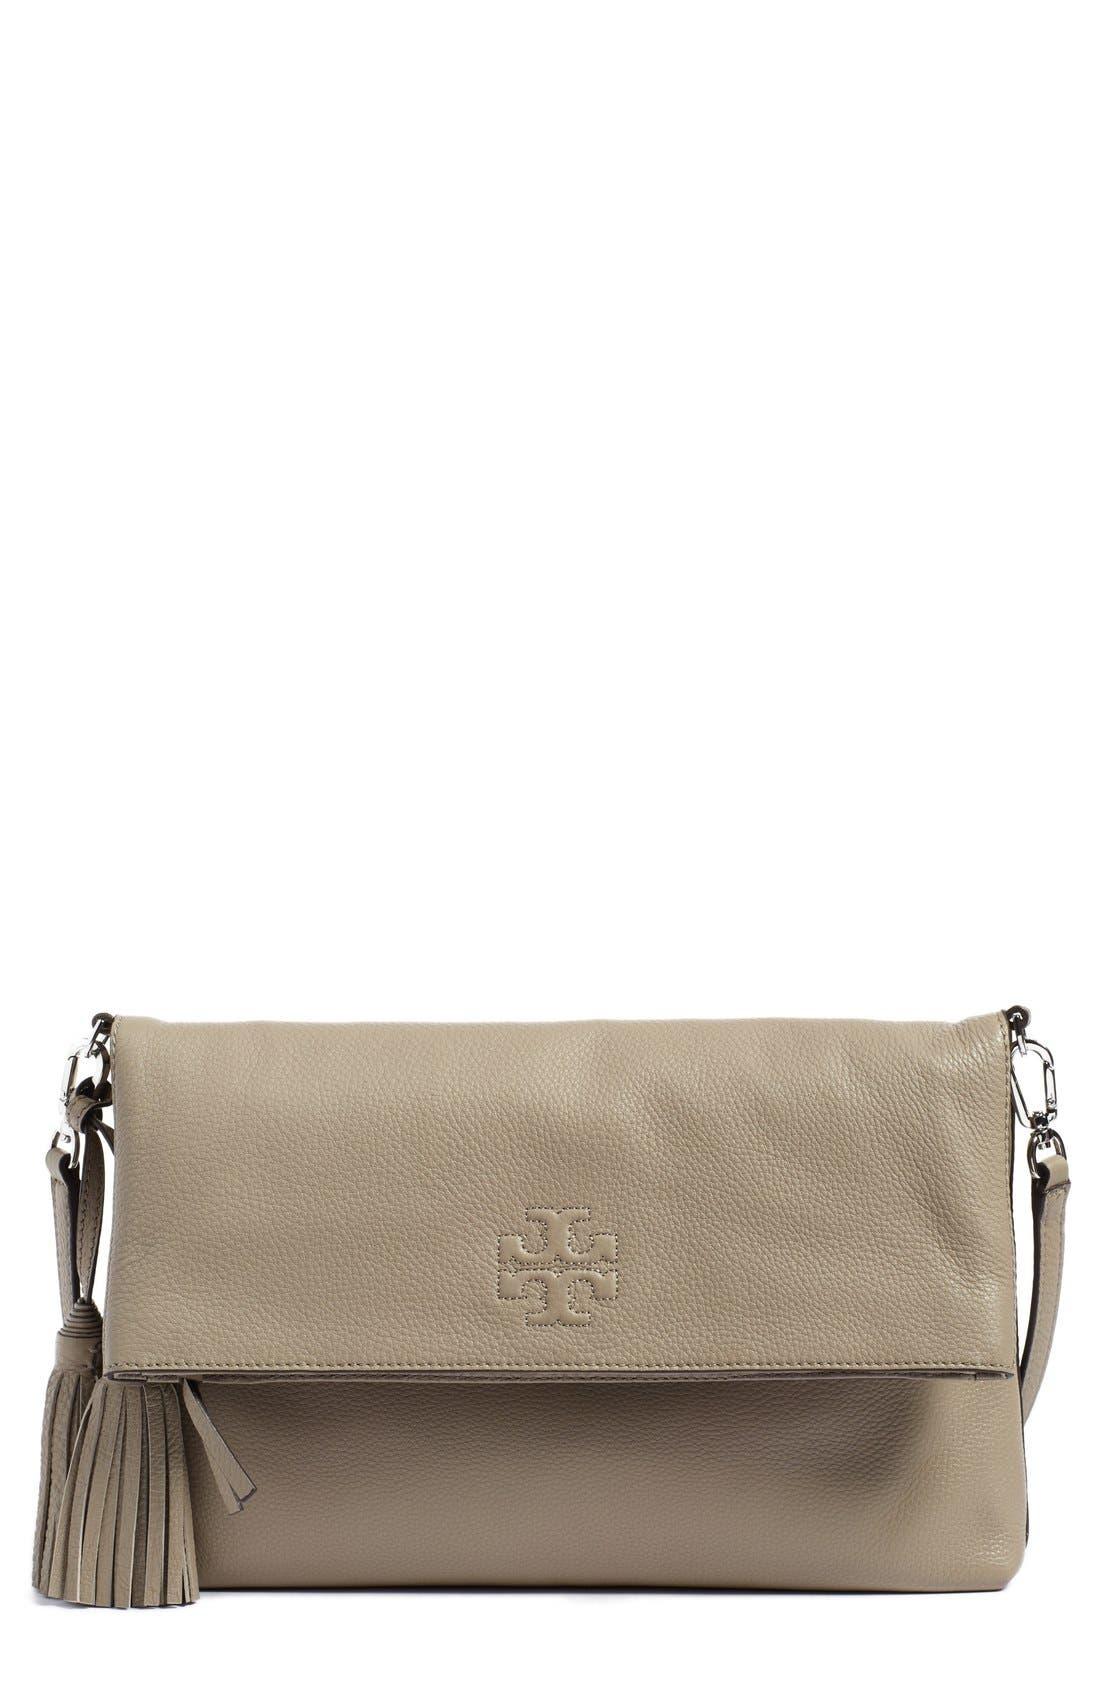 Main Image - Tory Burch 'Thea' Leather Foldover Crossbody Bag